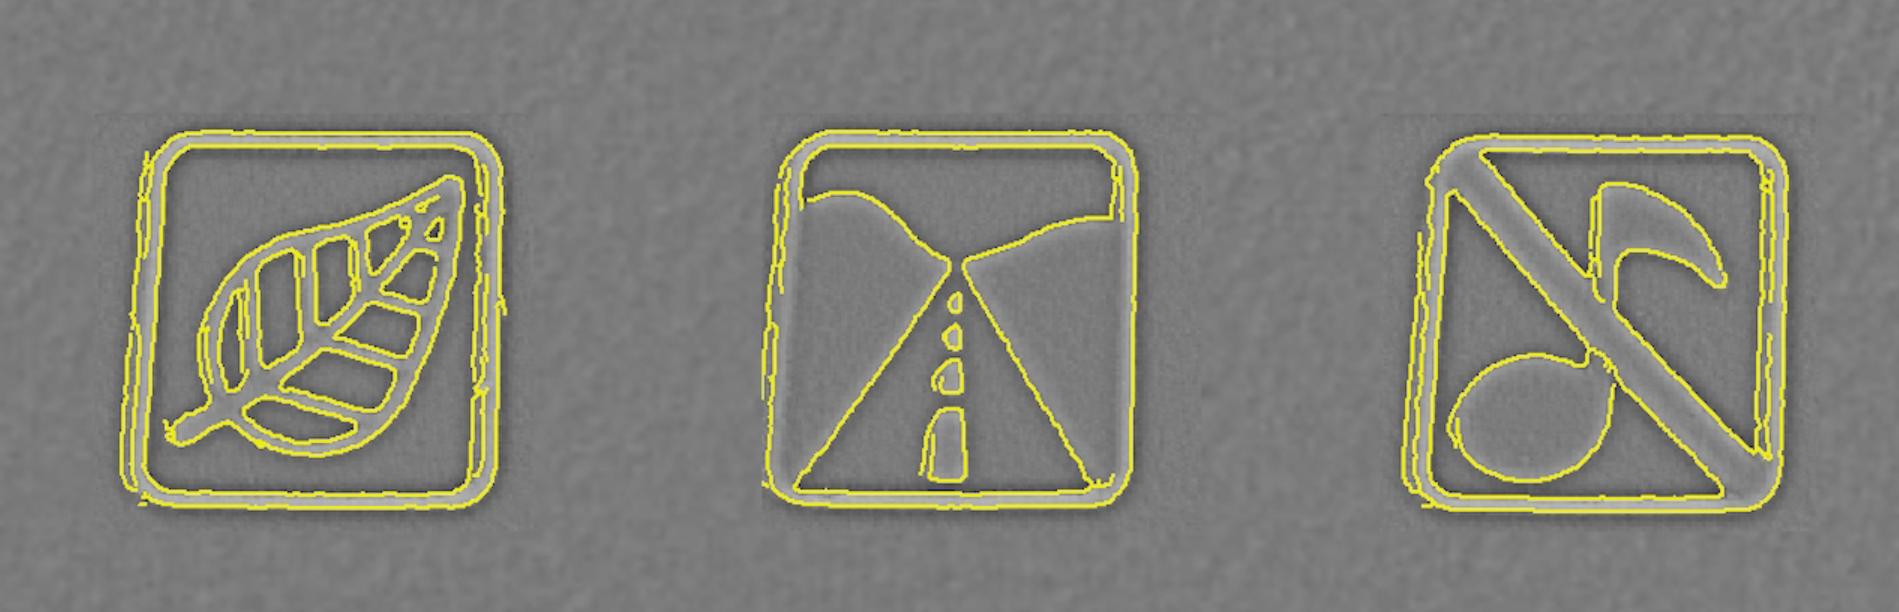 Lettering process - Symbols